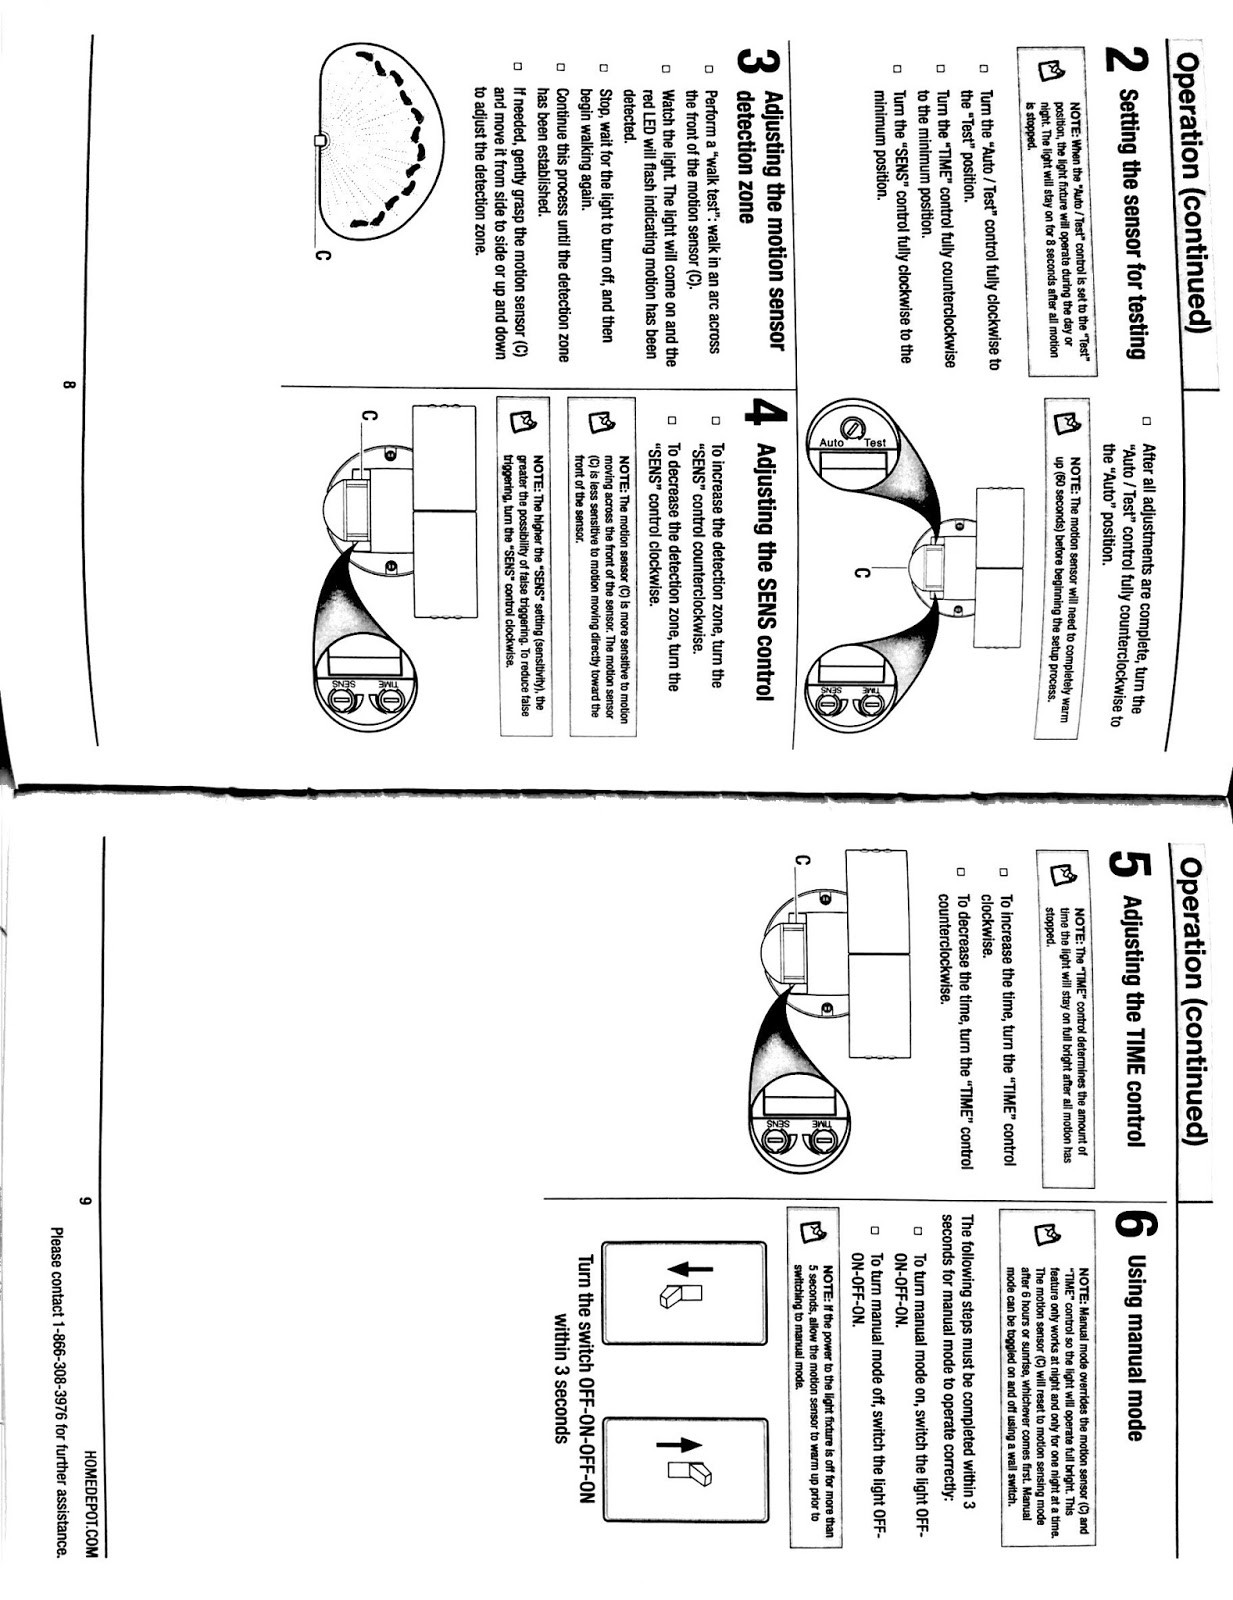 Navruzjon M. Shayusupov: Defiant DFI-5982-WH Motion